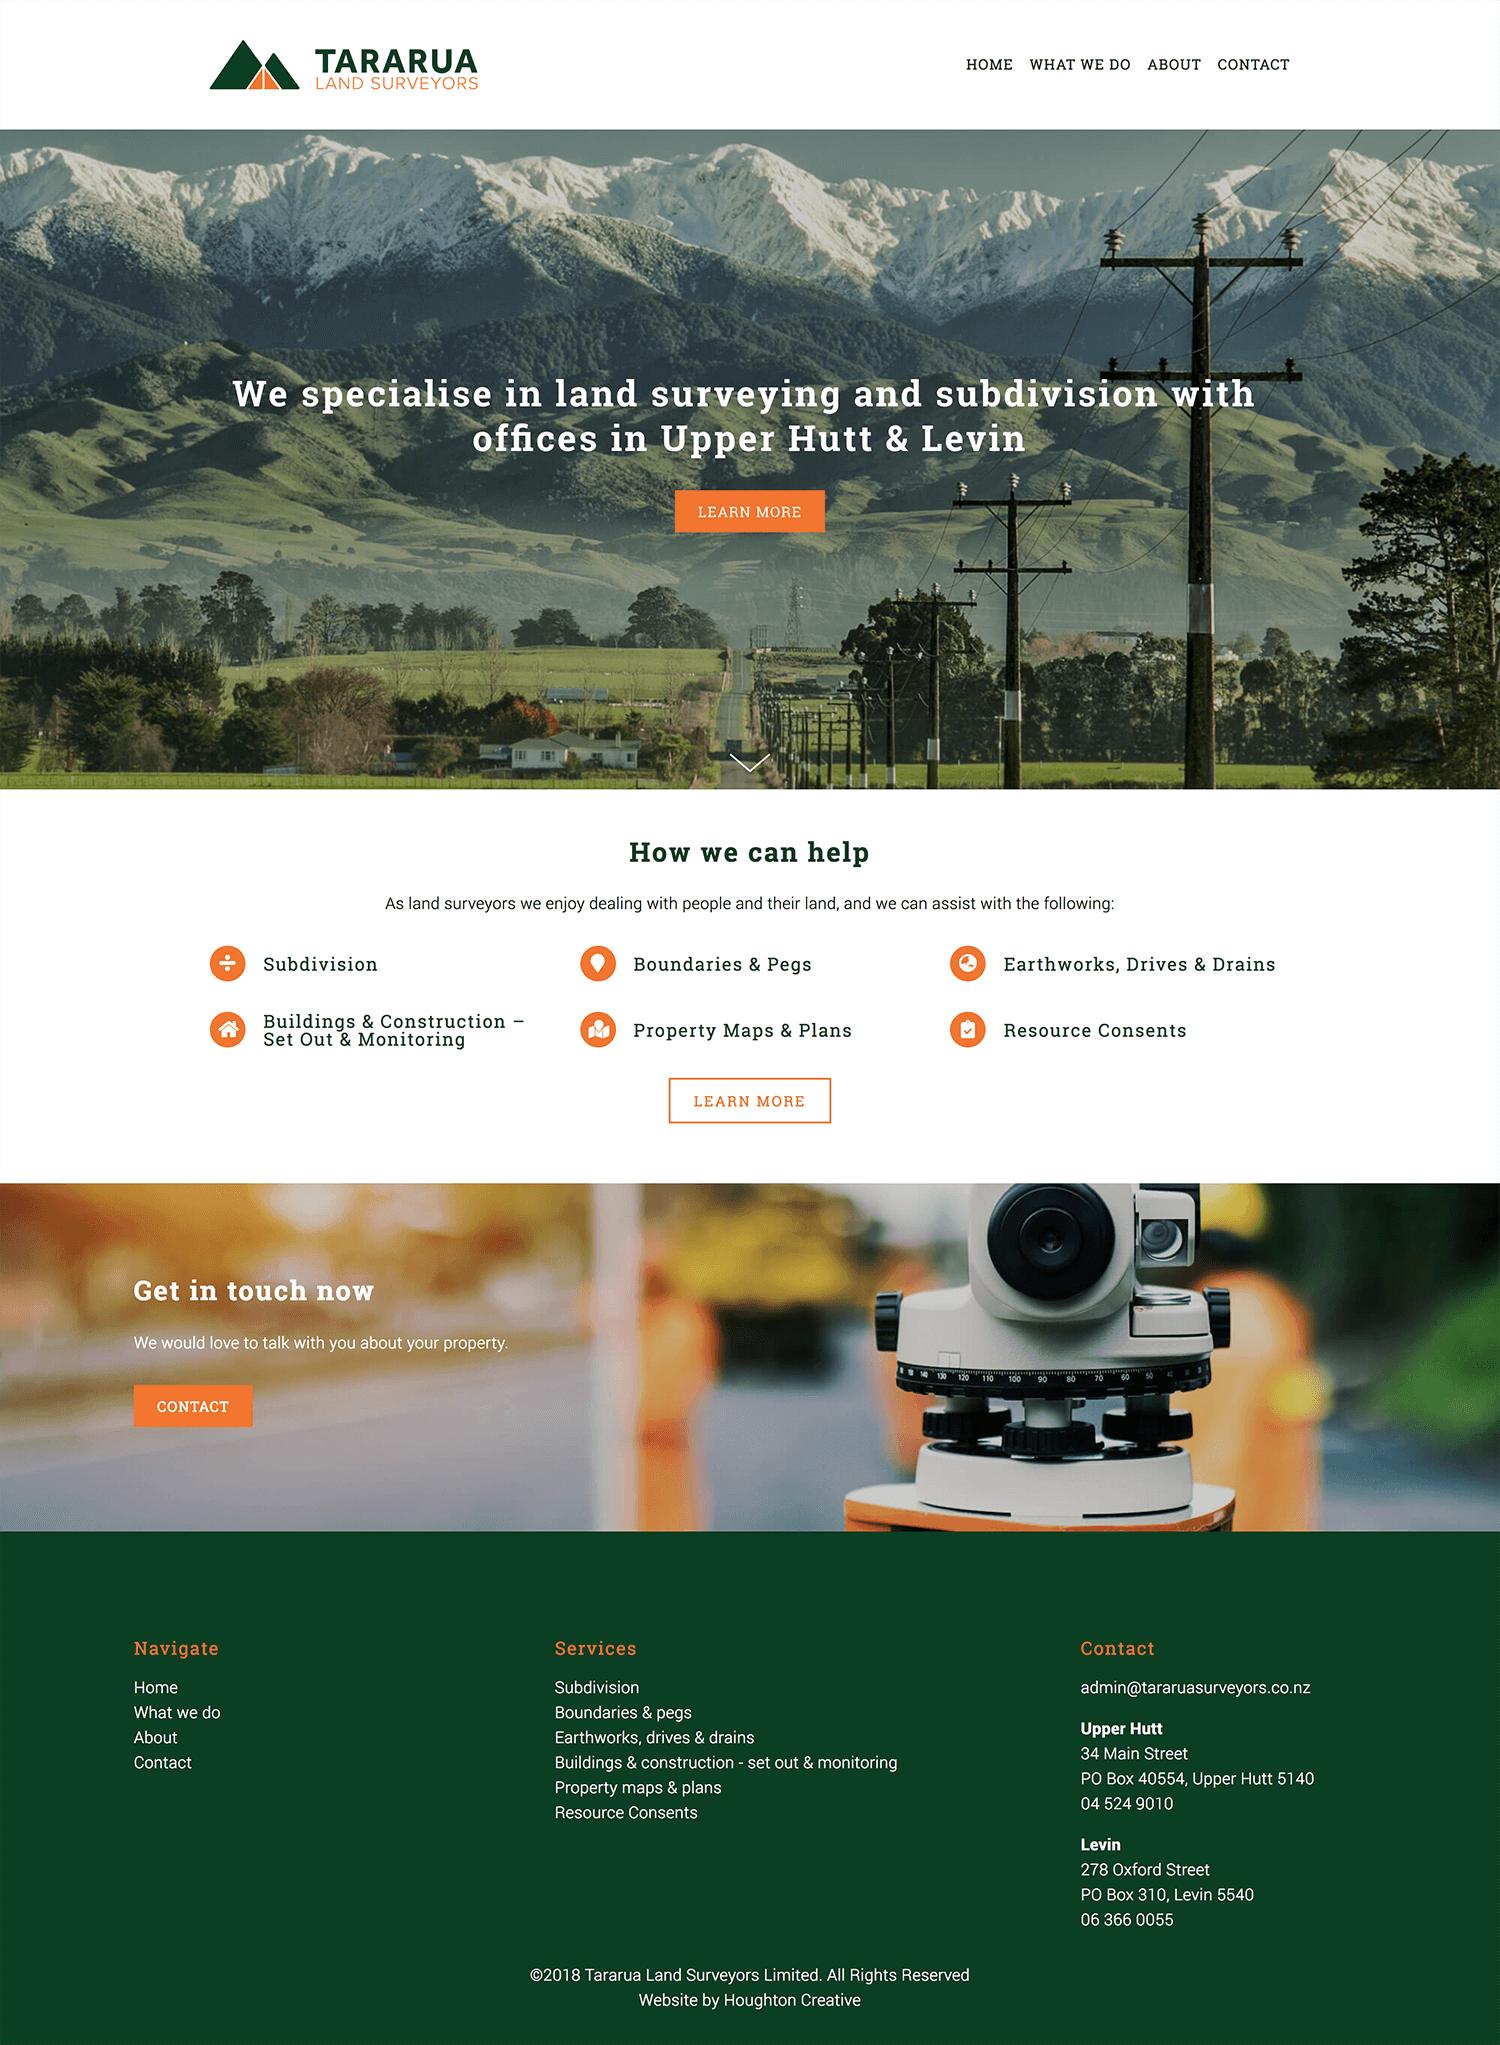 Home page - Tararua Land Surveyors